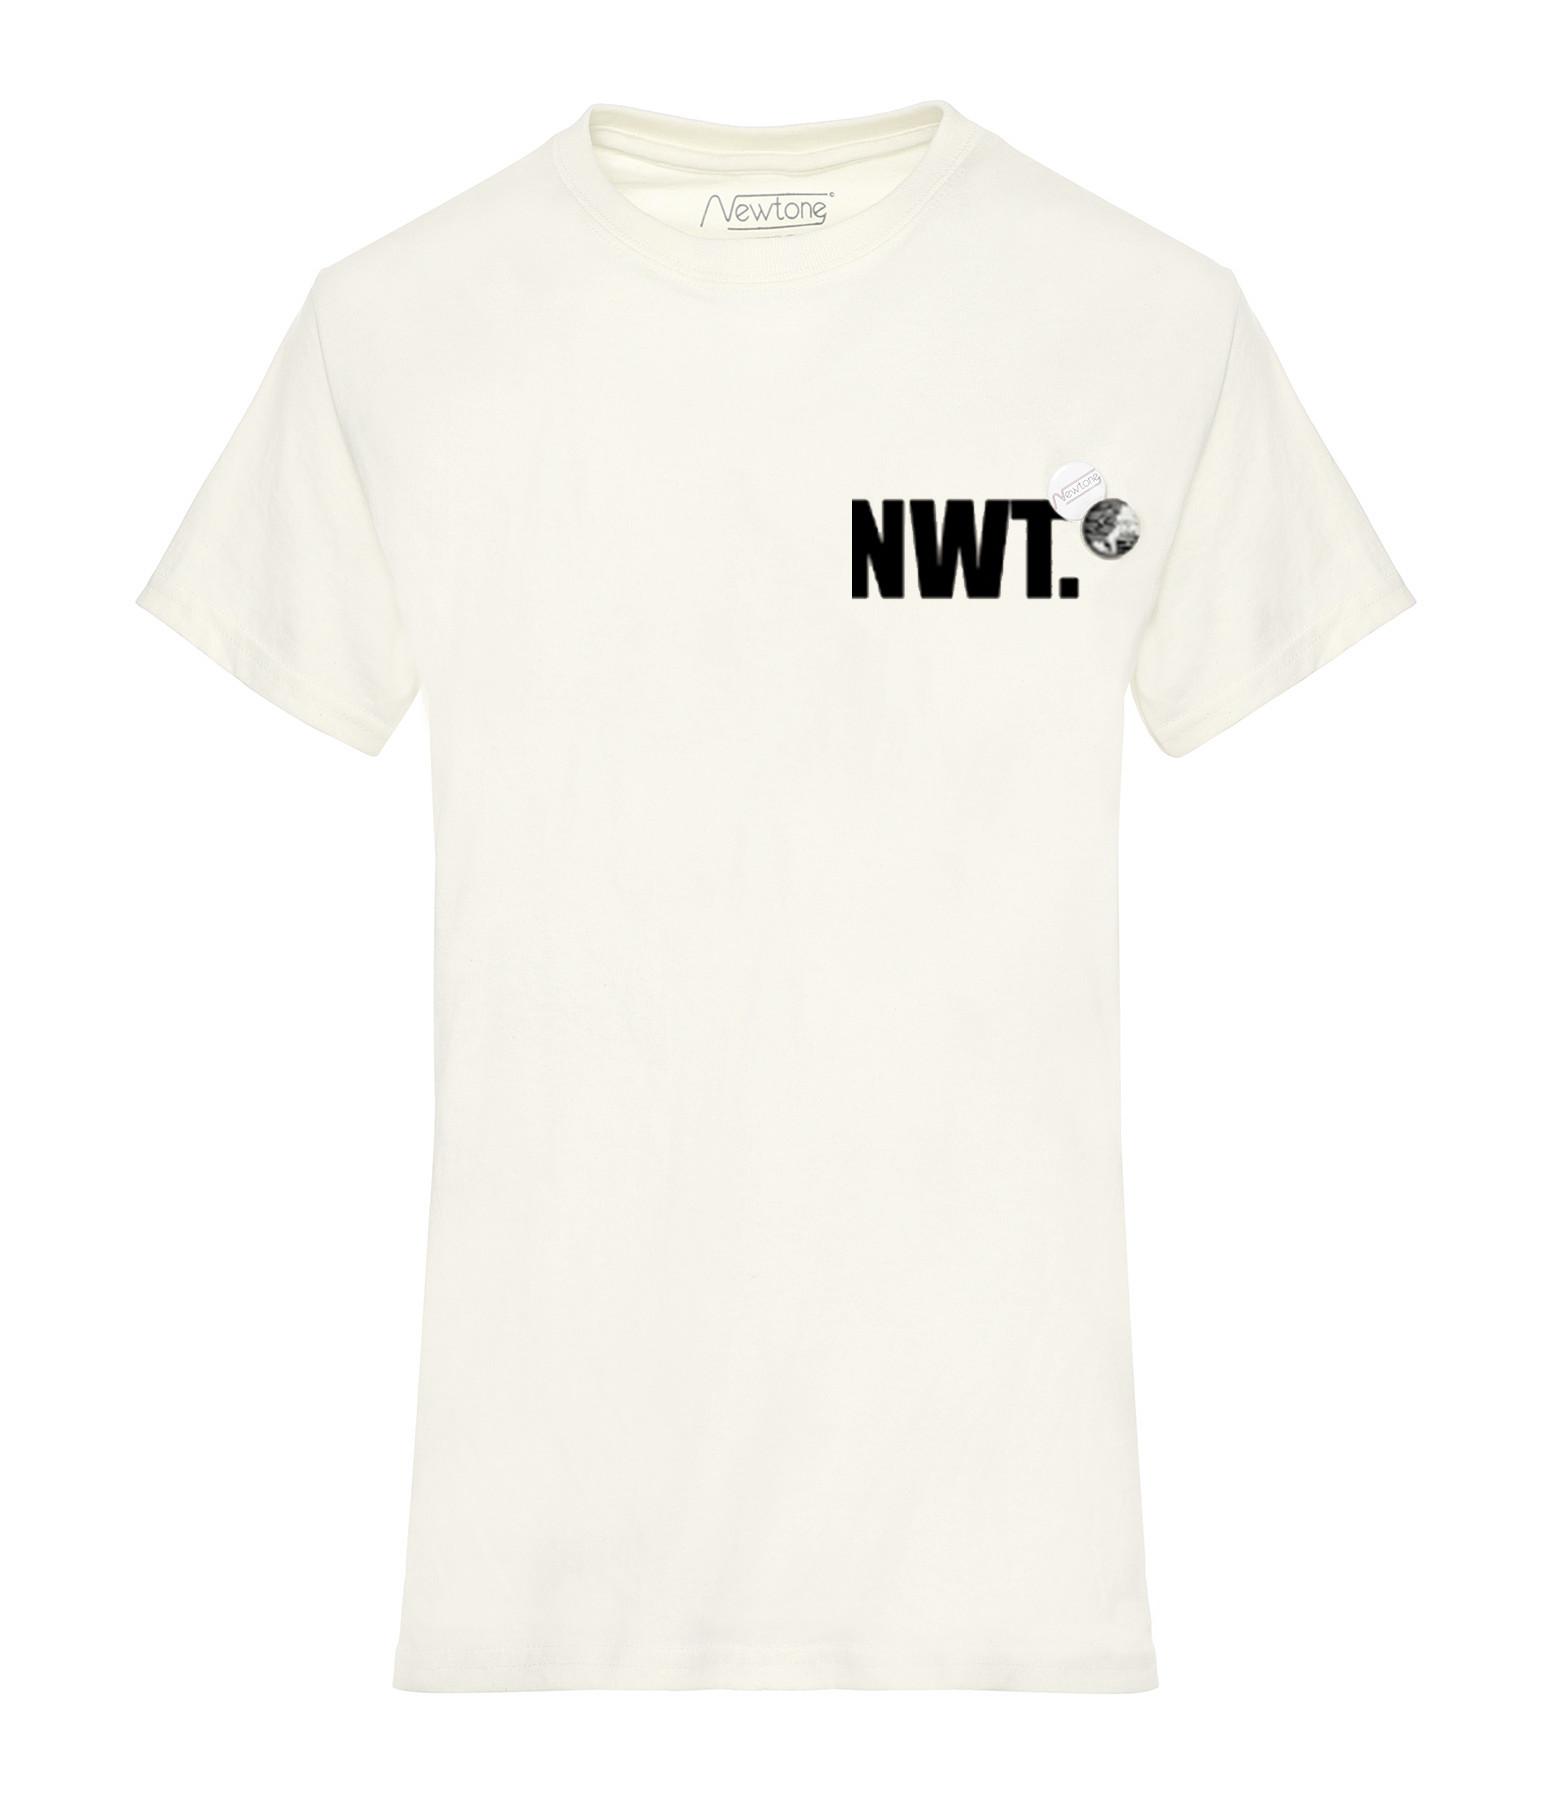 NEWTONE - Tee-shirt Pistols Coton Naturel